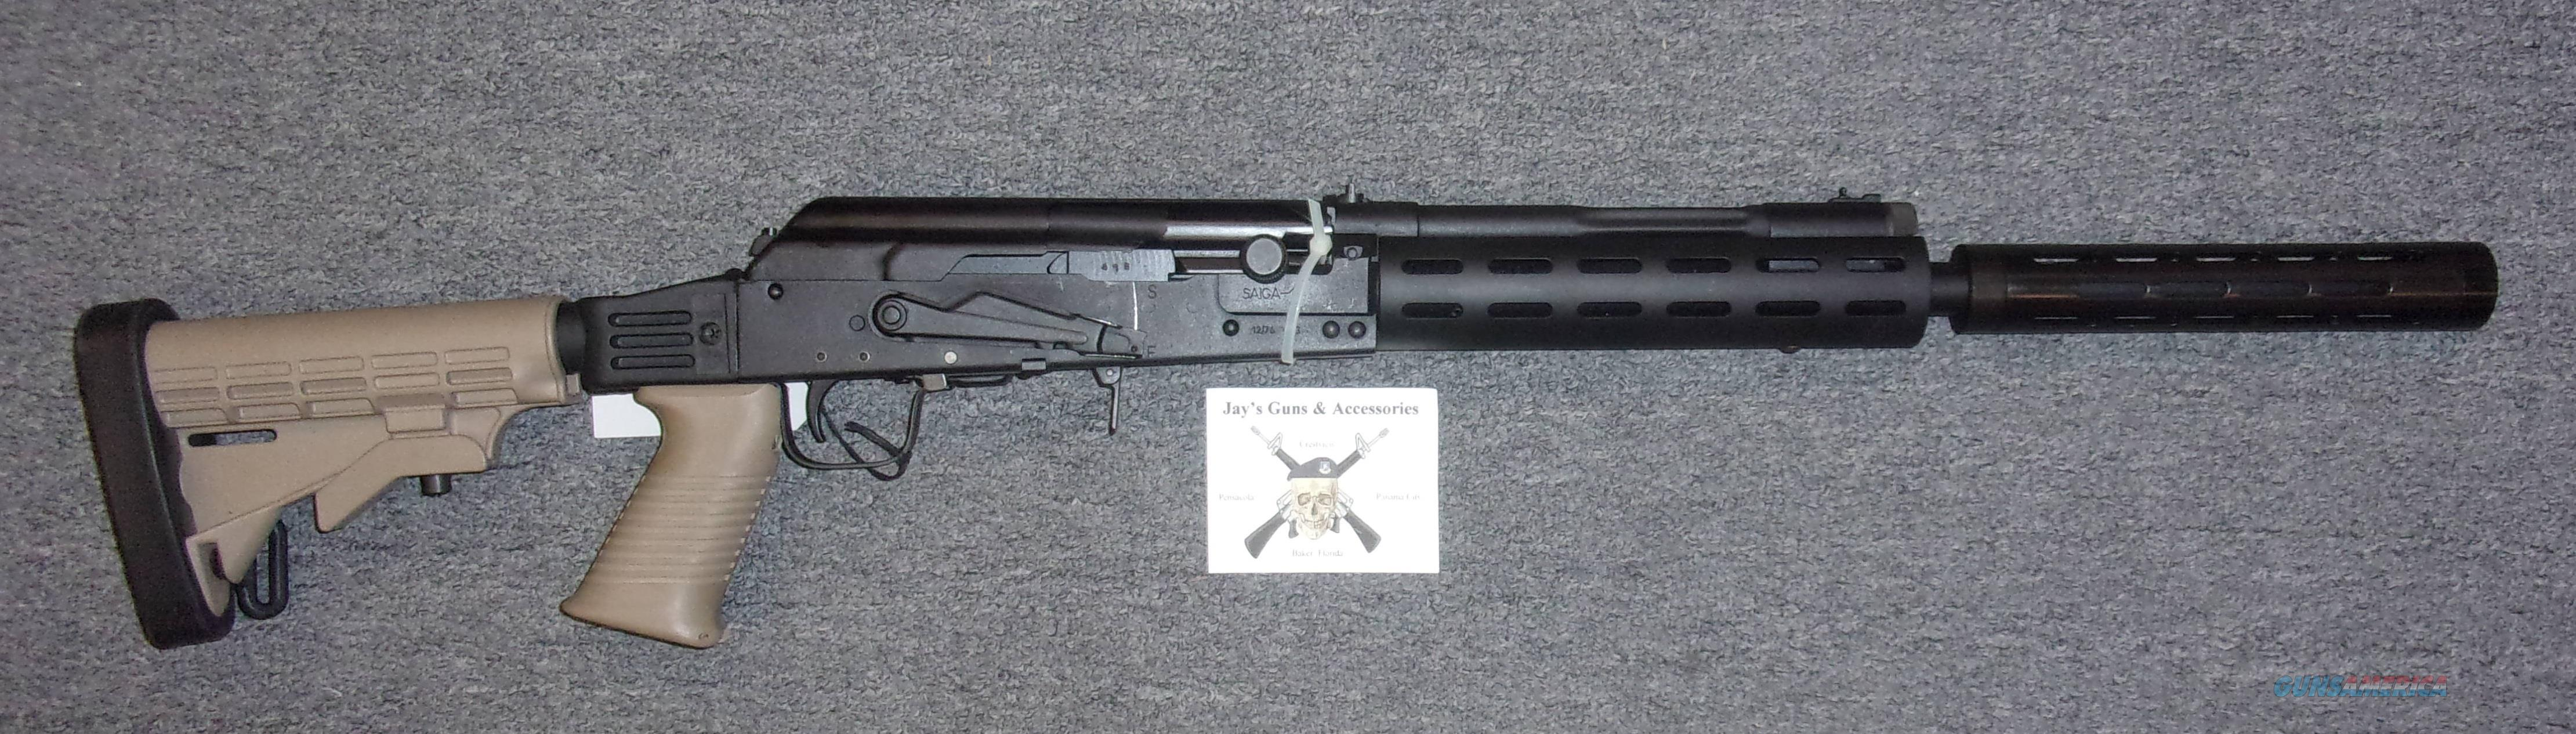 Russian/Arsenal Saiga 12  Guns > Shotguns > Saiga Shotguns > Shotguns